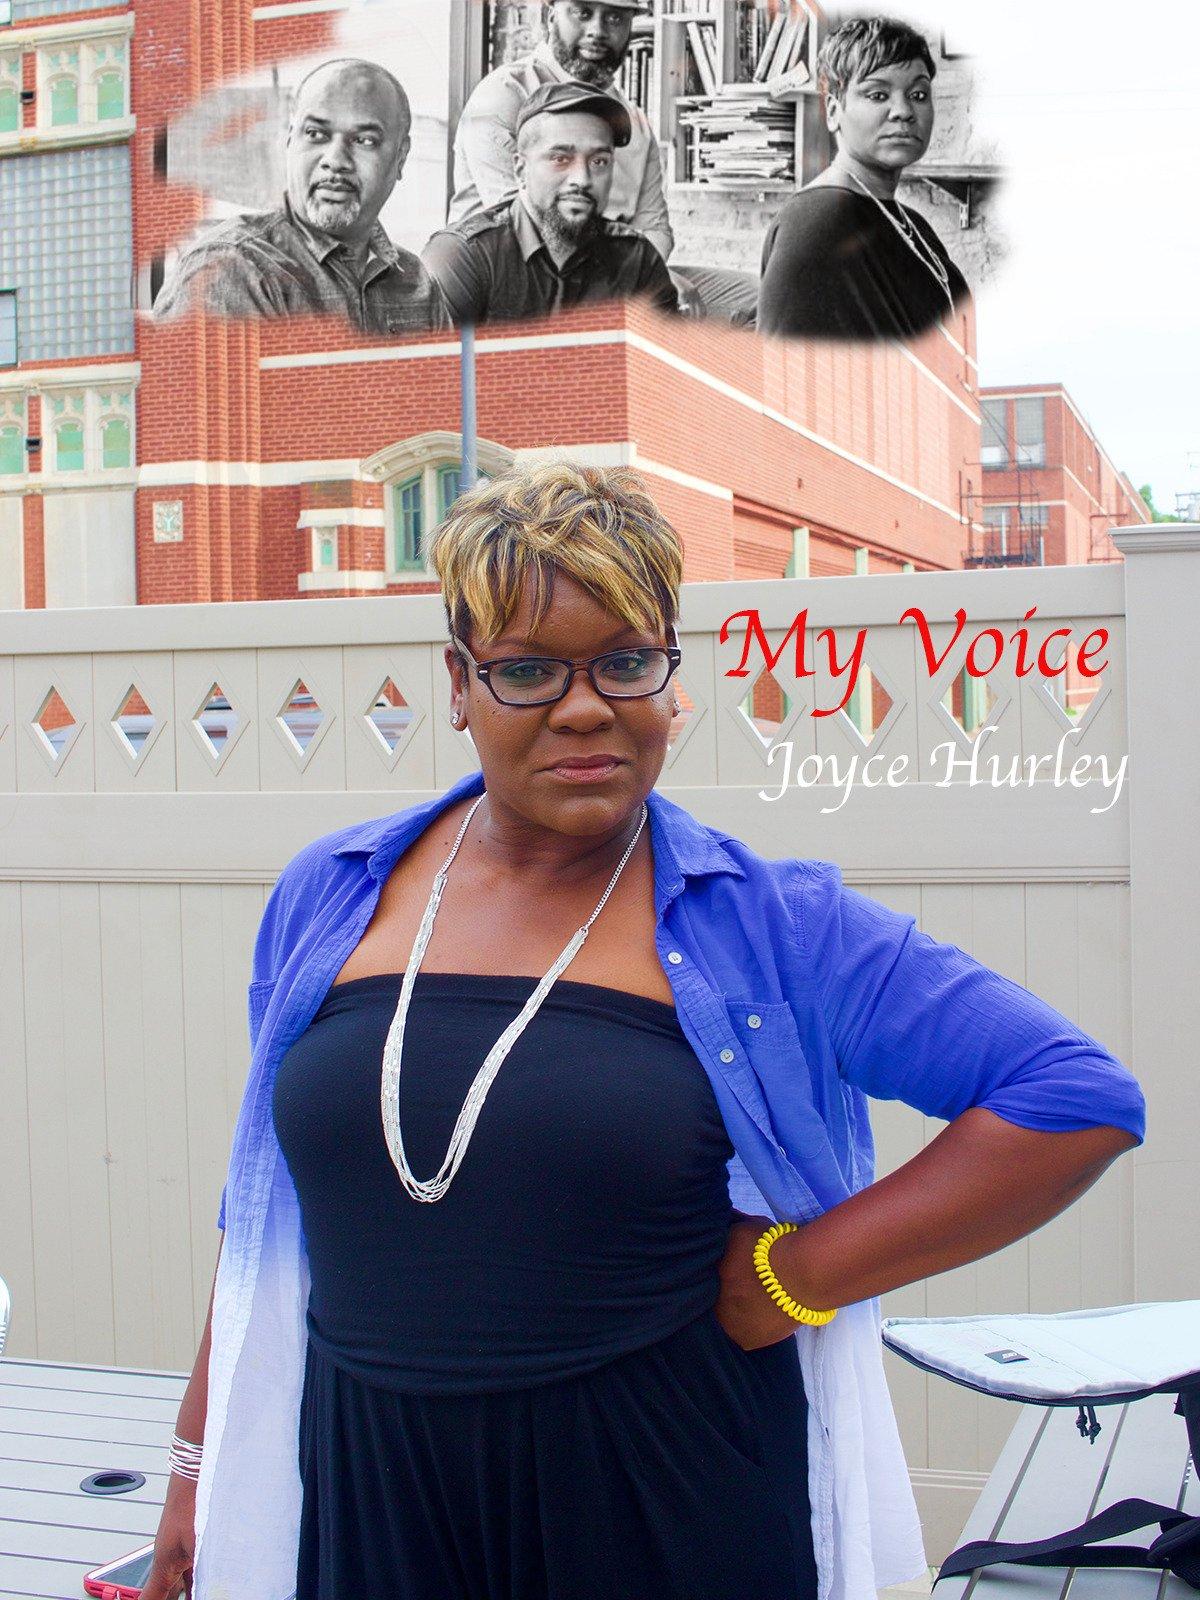 My Voice - Joyce Hurley